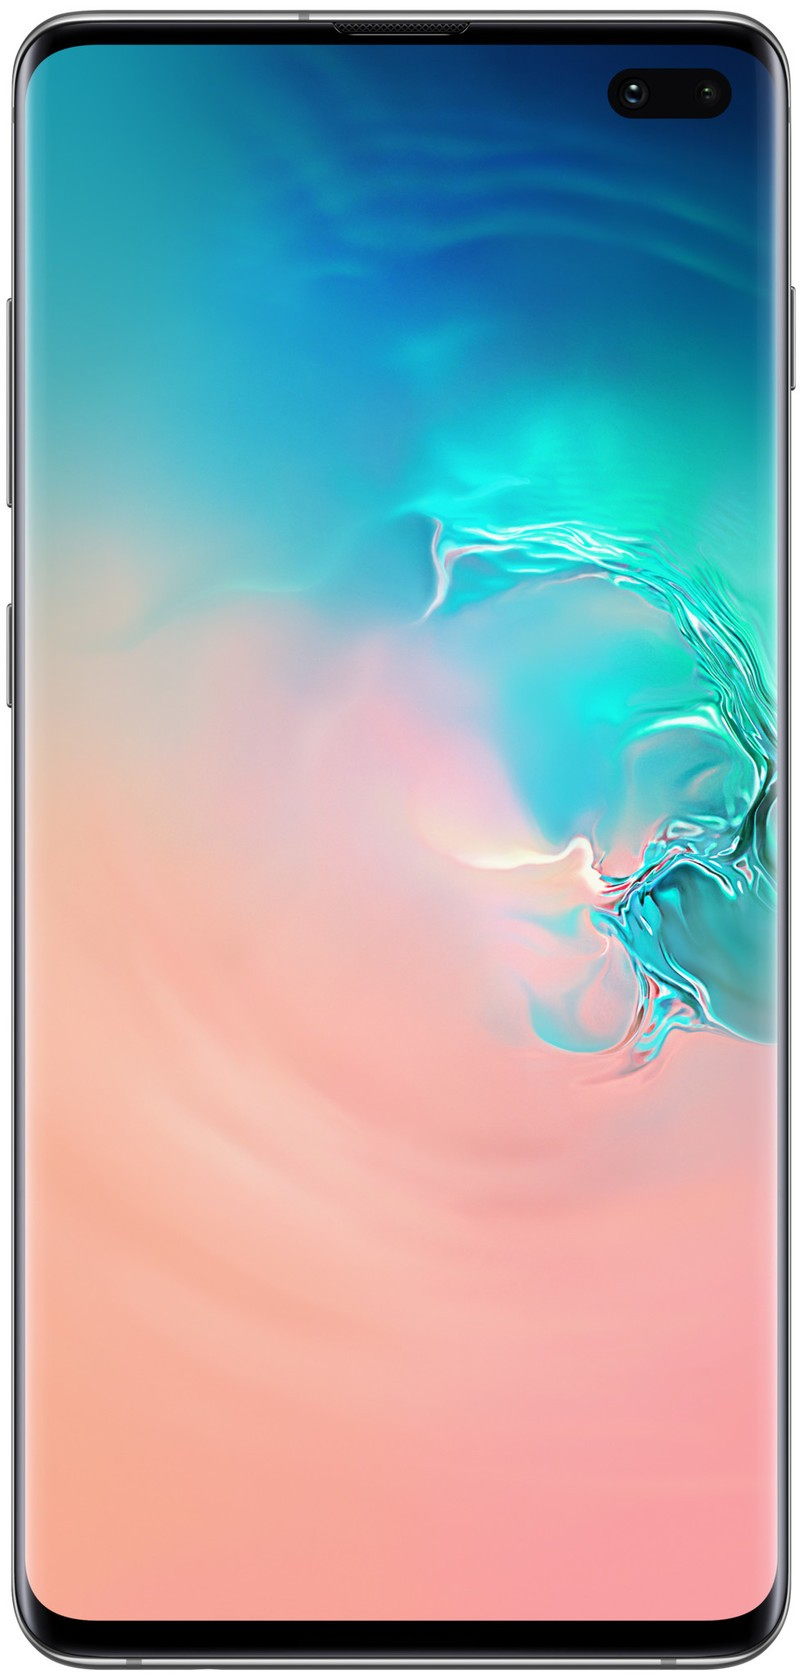 galaxy-s10-plus-render-front-white.jpg?i